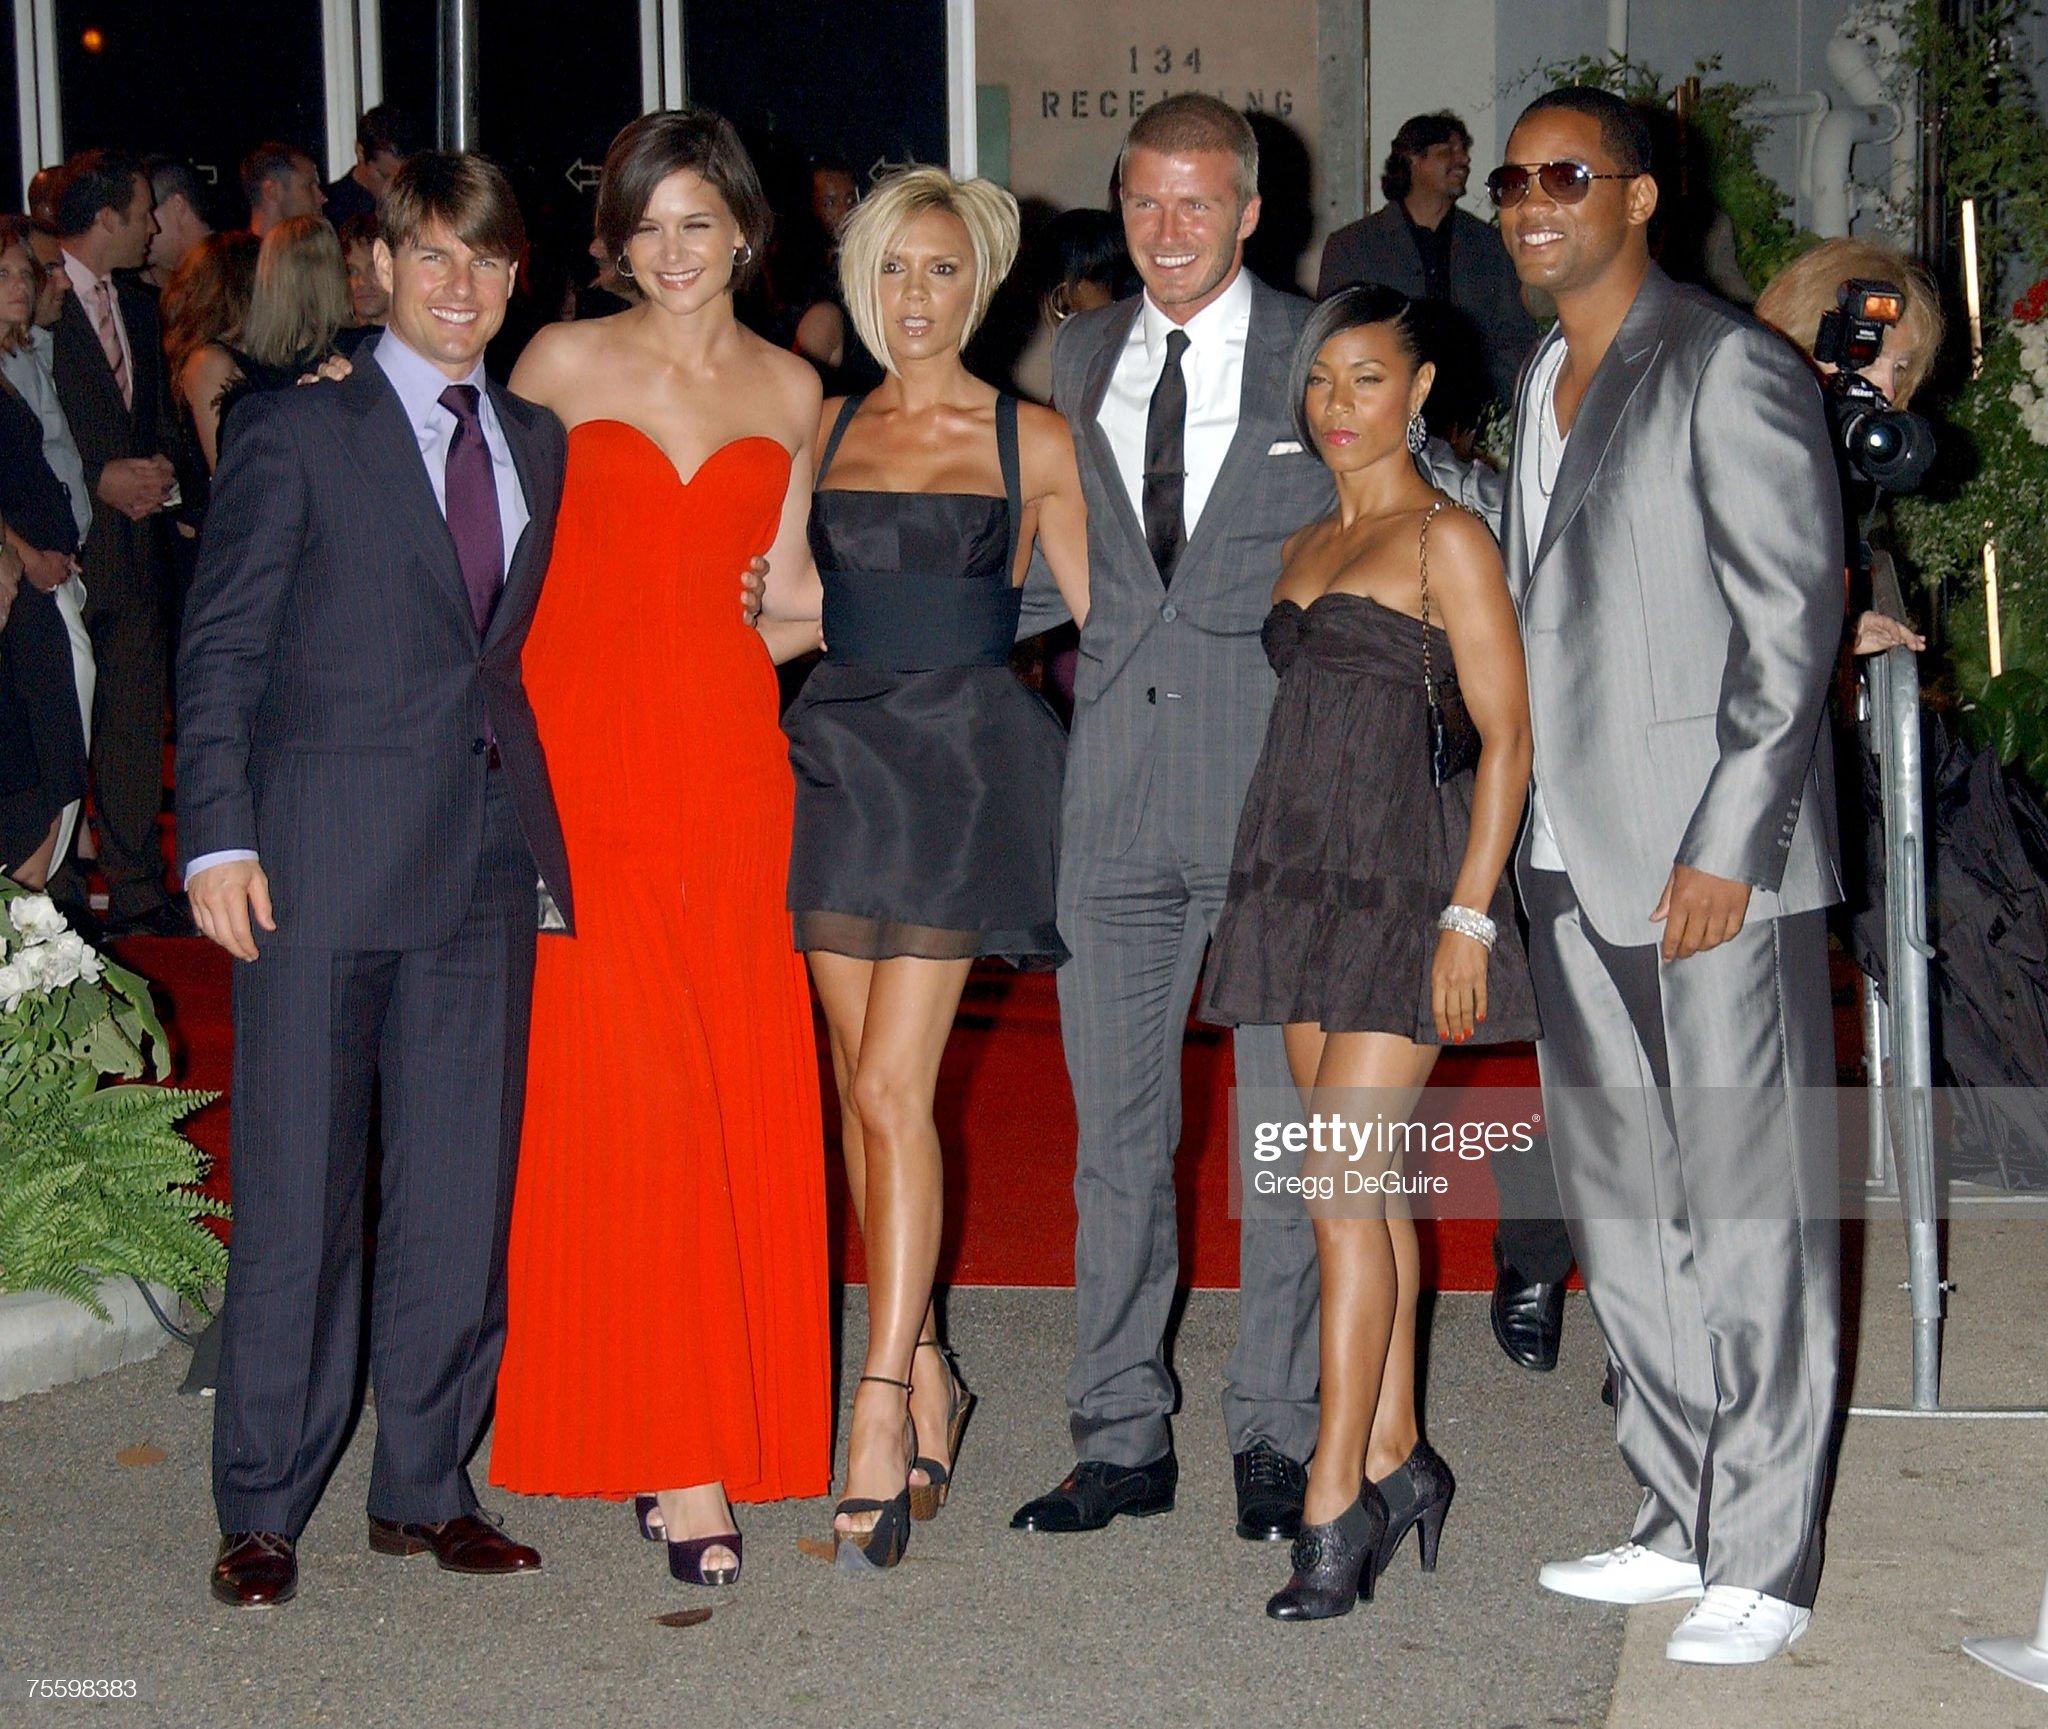 ¿Cuánto mide David Beckham? - Altura - Real height Actor-tom-cruise-katie-holmes-victoria-beckham-david-beckham-jada-picture-id75598383?s=2048x2048